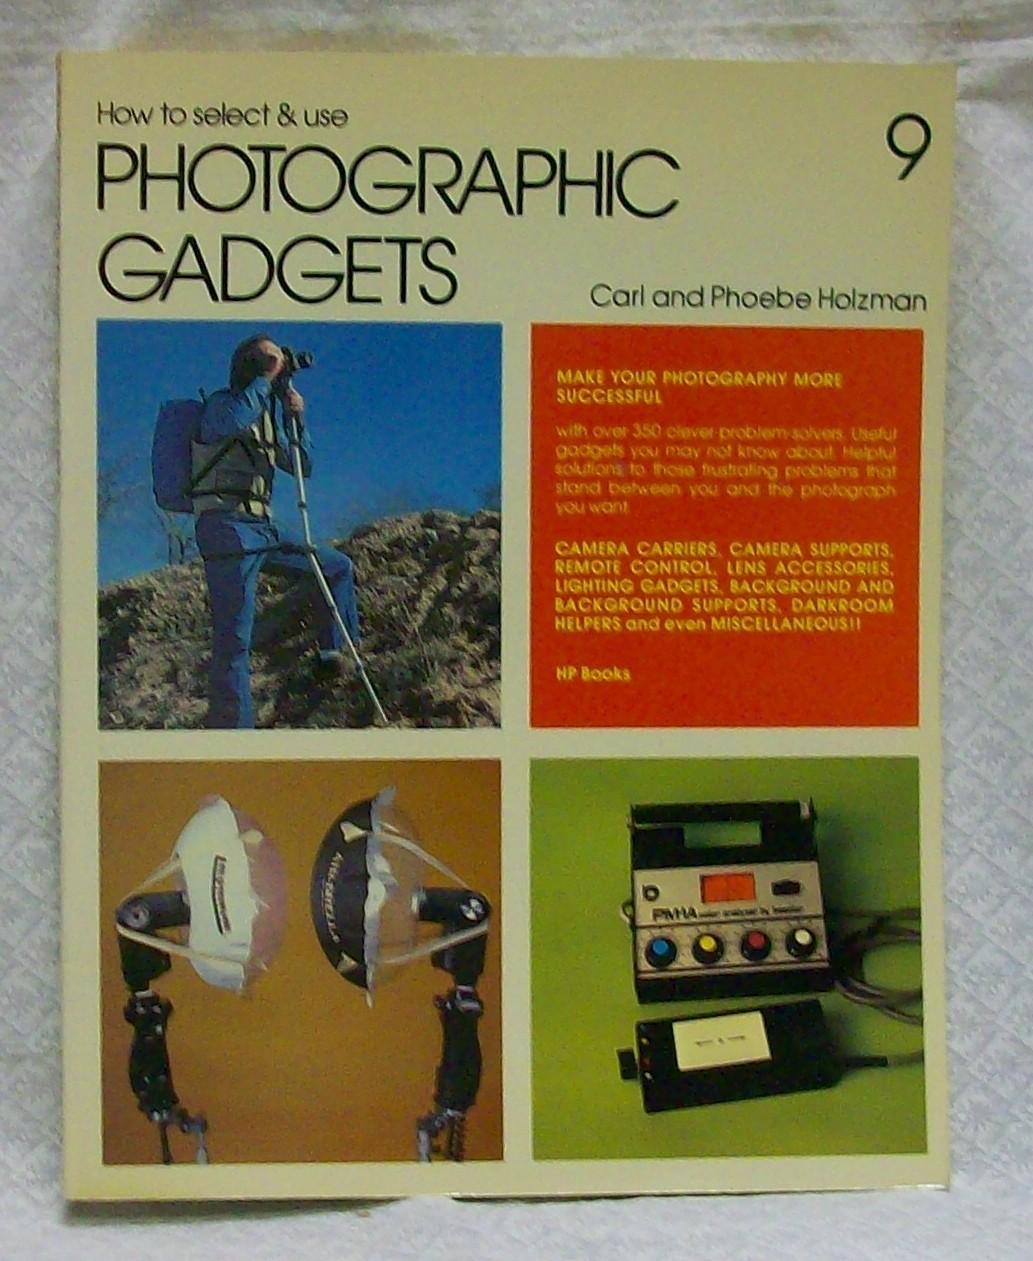 Photogadgets